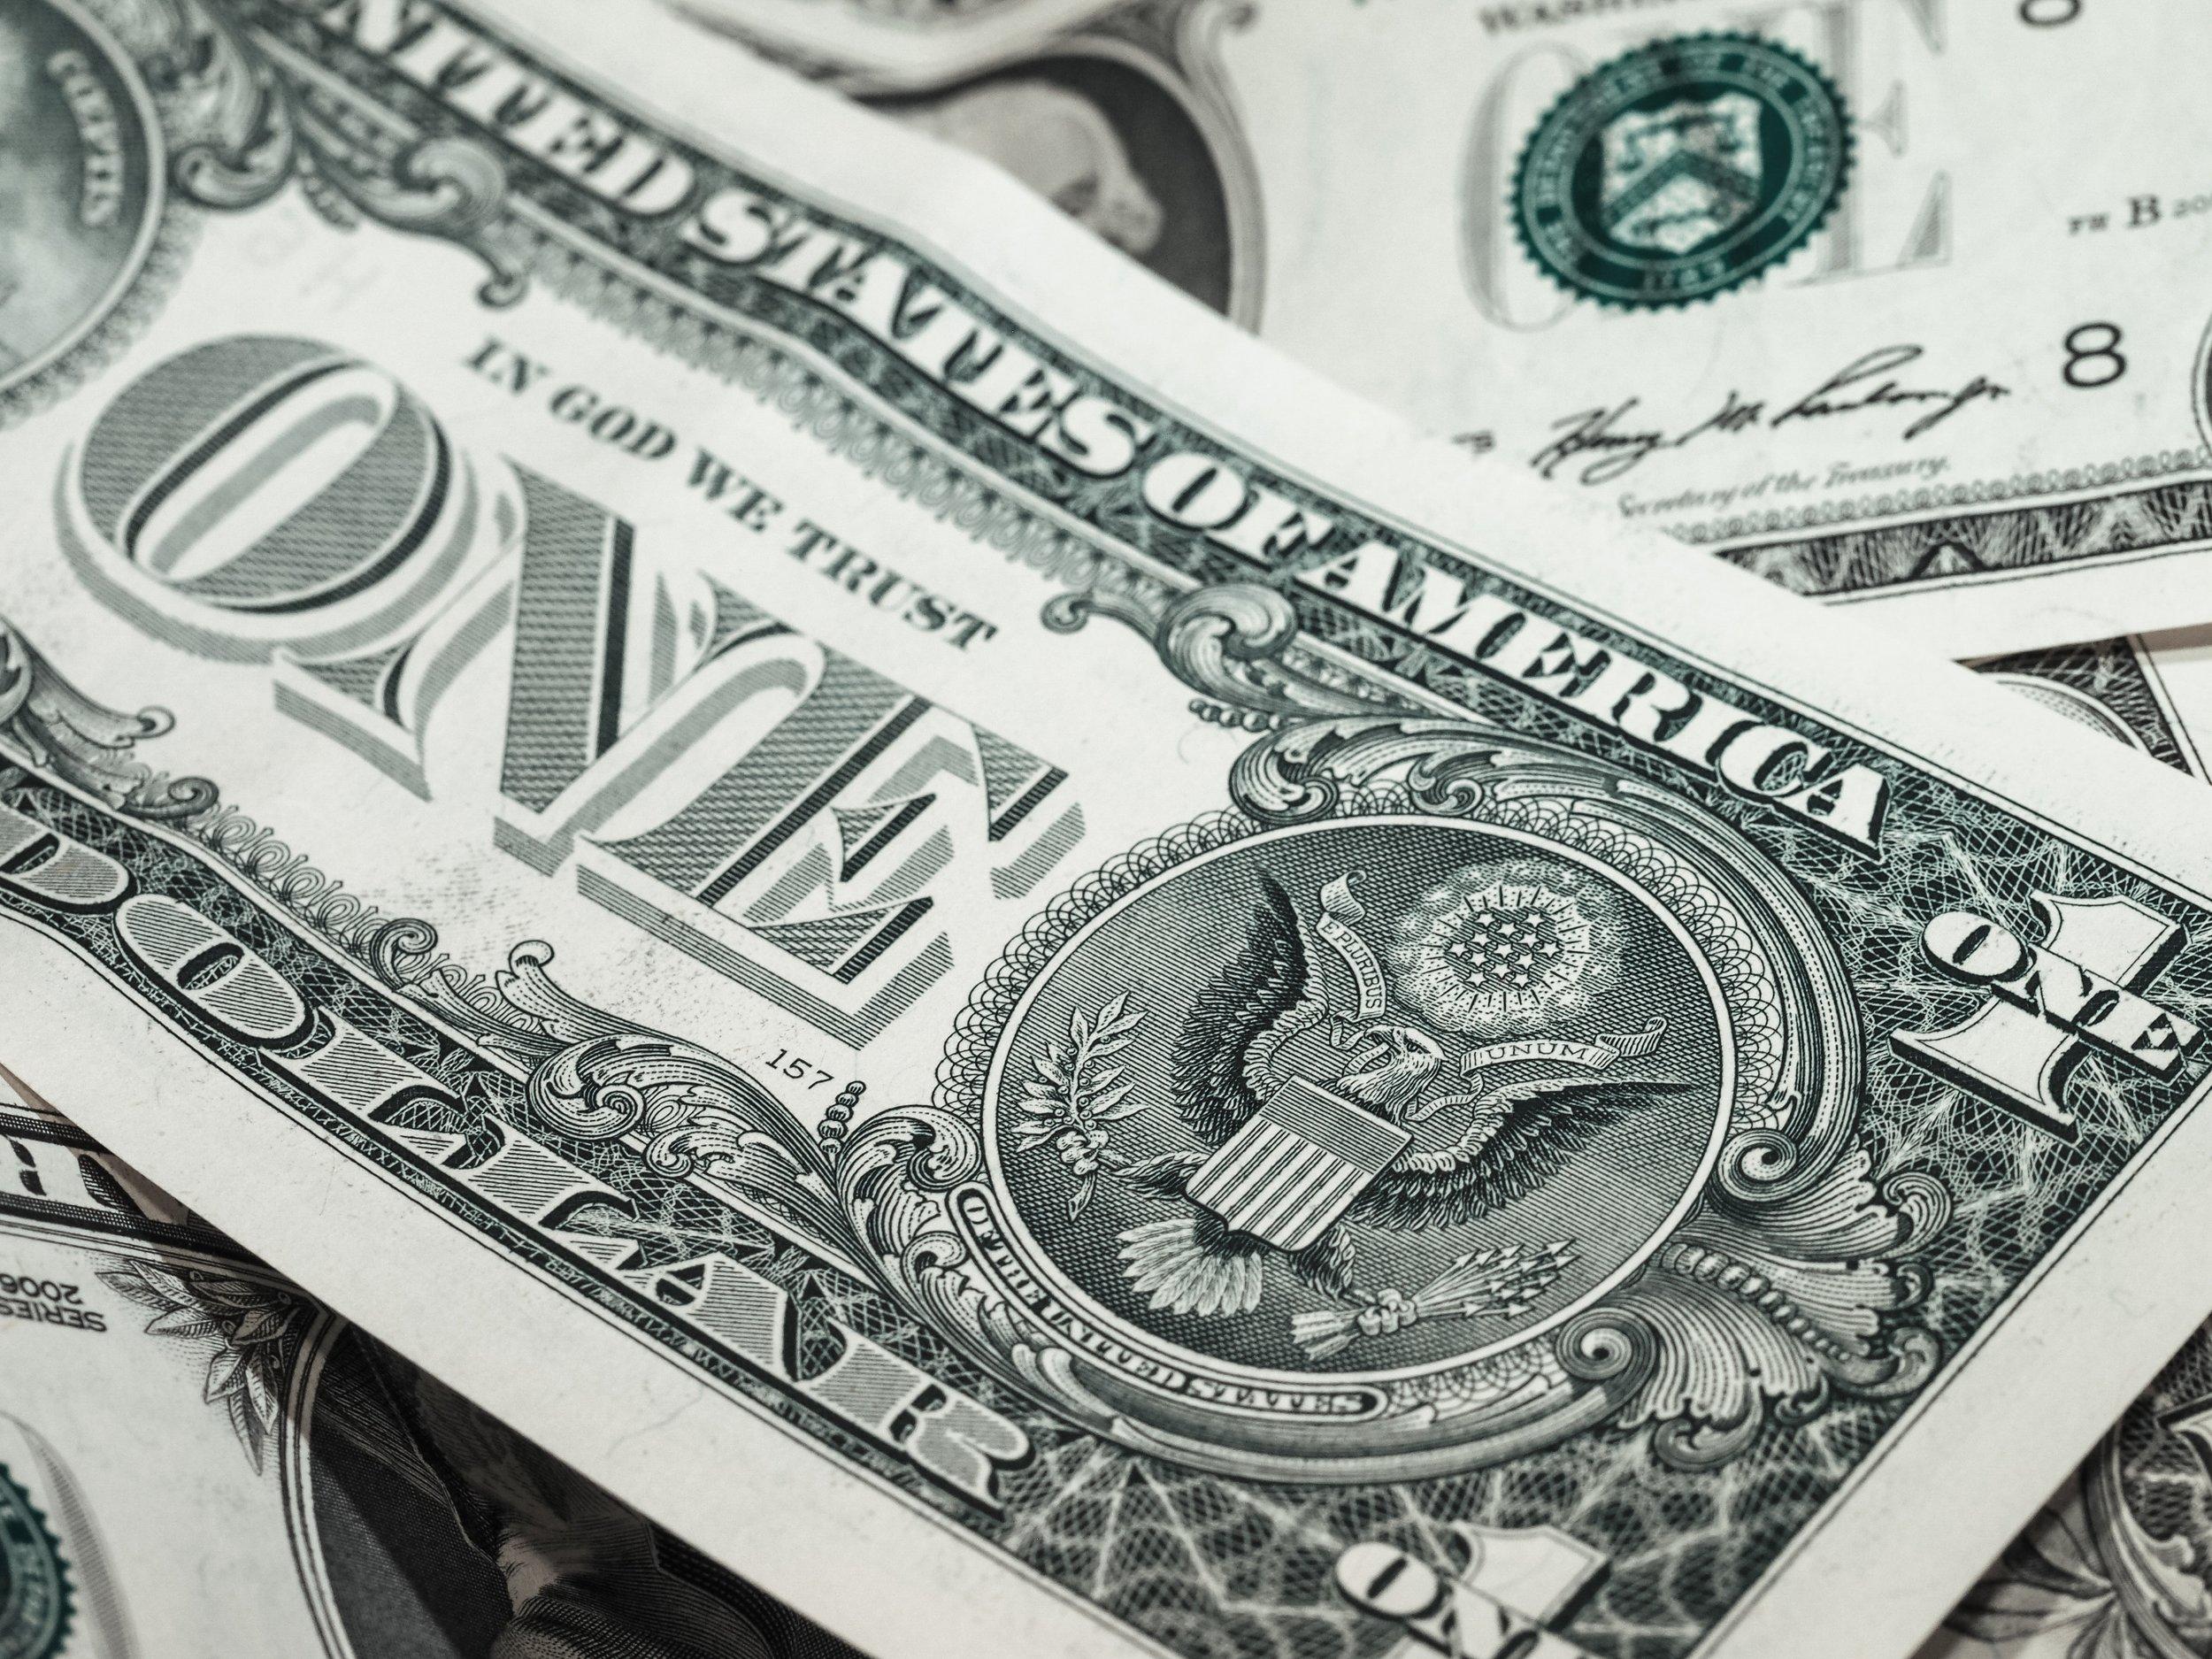 bank-note-bills-budget-164661.jpg